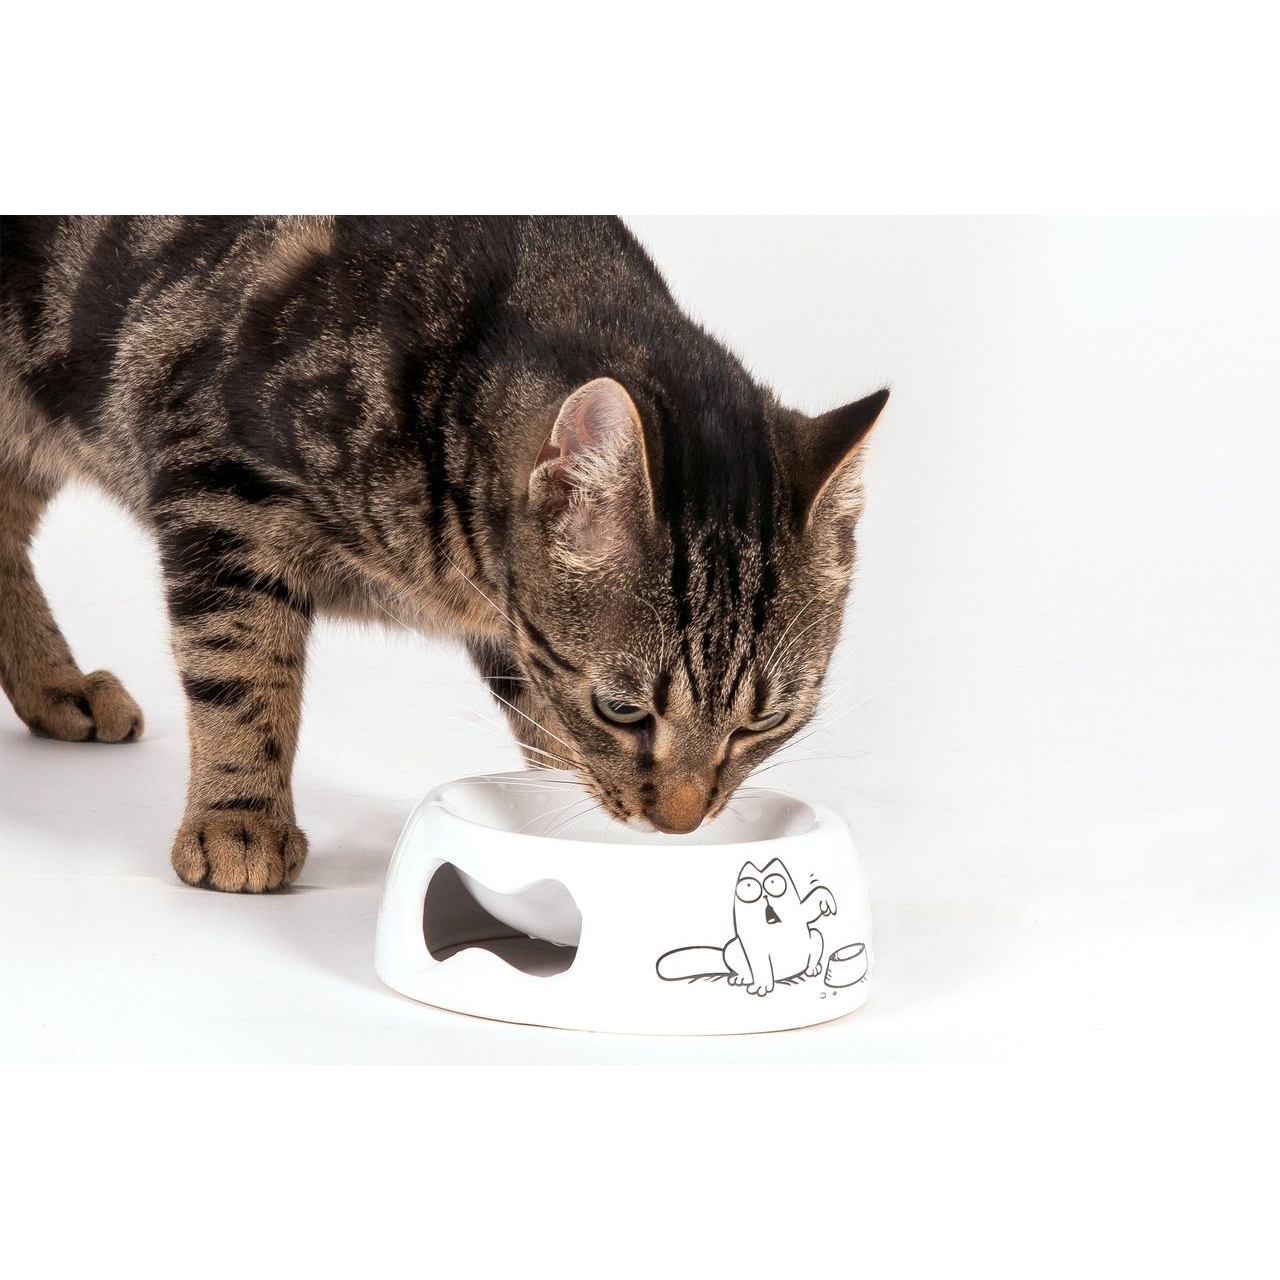 Karlie Simons Cat Katzennapf weiss, Bild 2